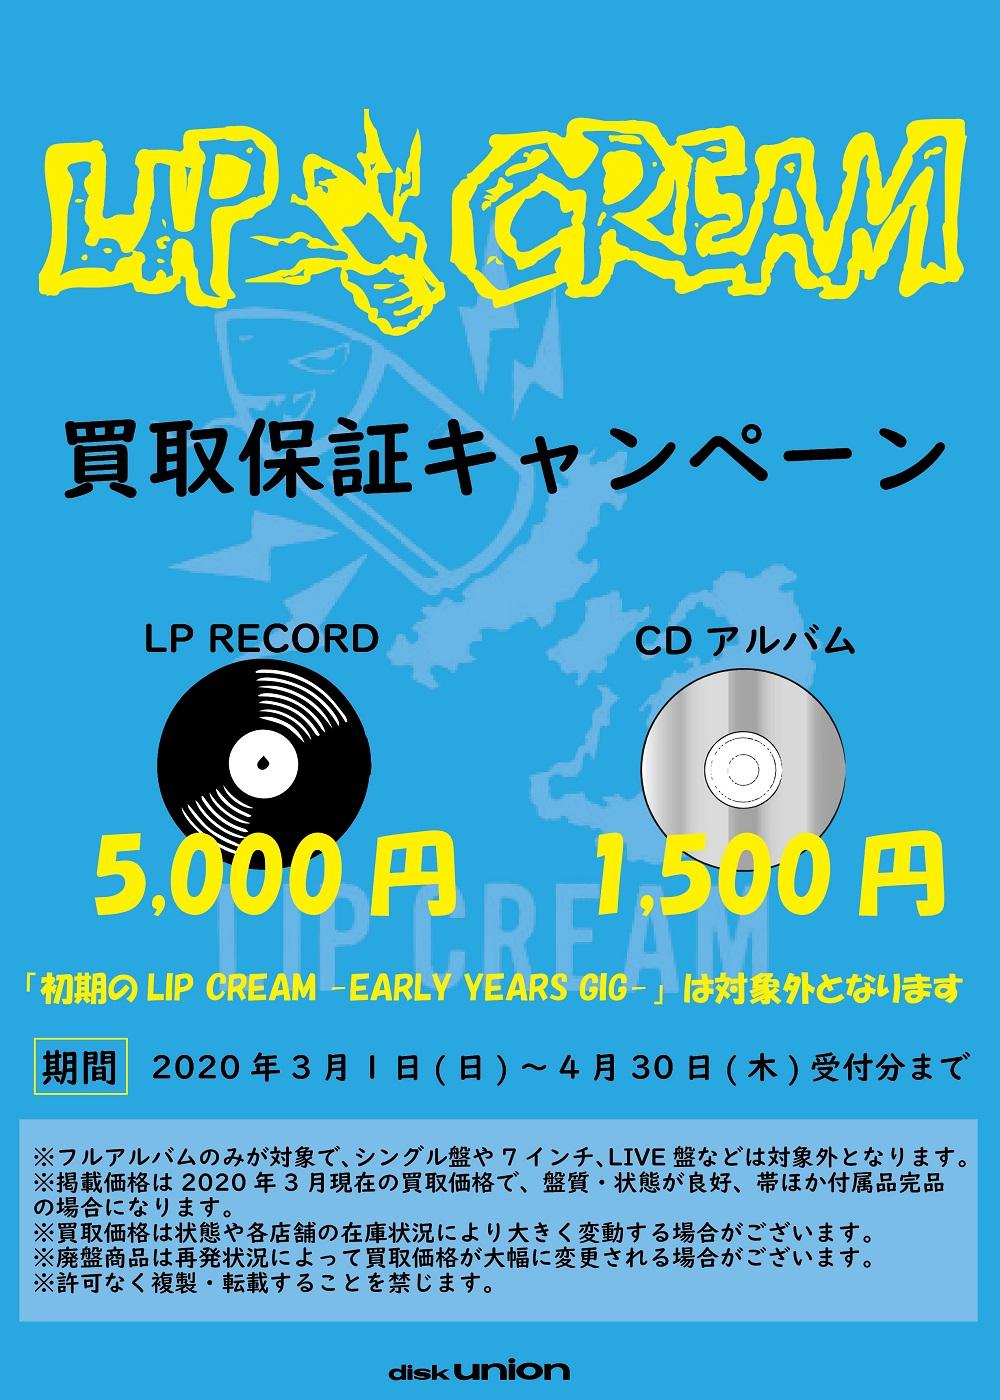 https://diskunion.net/images/kaitori_list/2020/202002_punk_lipcream_pop.jpg